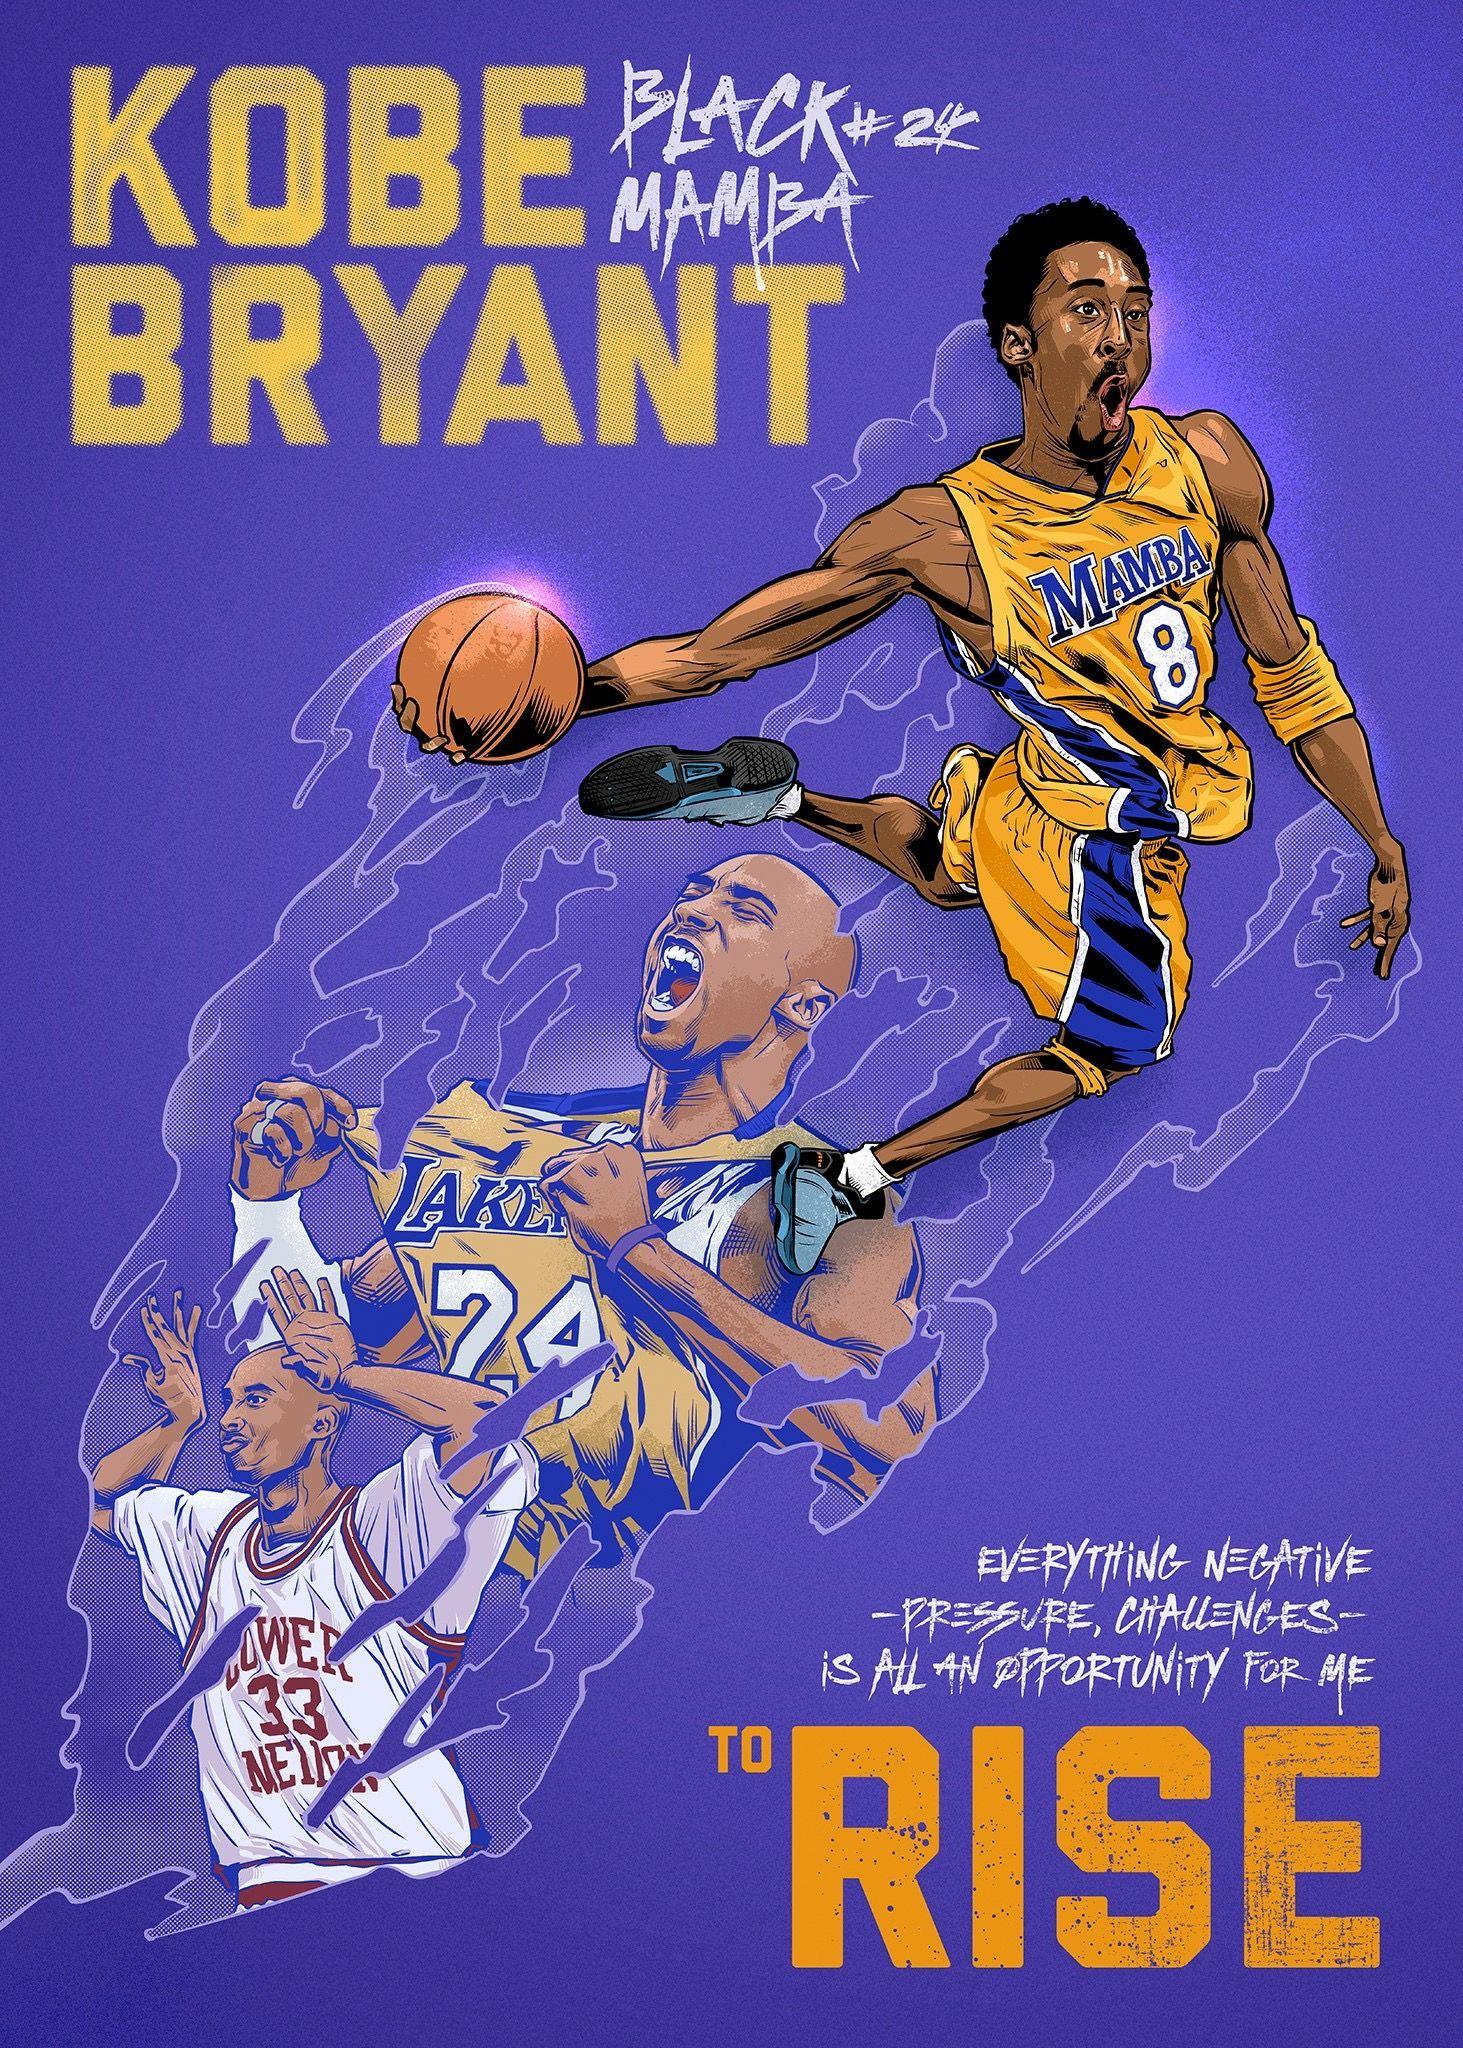 Pin By Andy Scott On Black Mamba 8 24 Kobe Bryant Wallpaper Kobe Bryant Black Mamba Best Nba Players